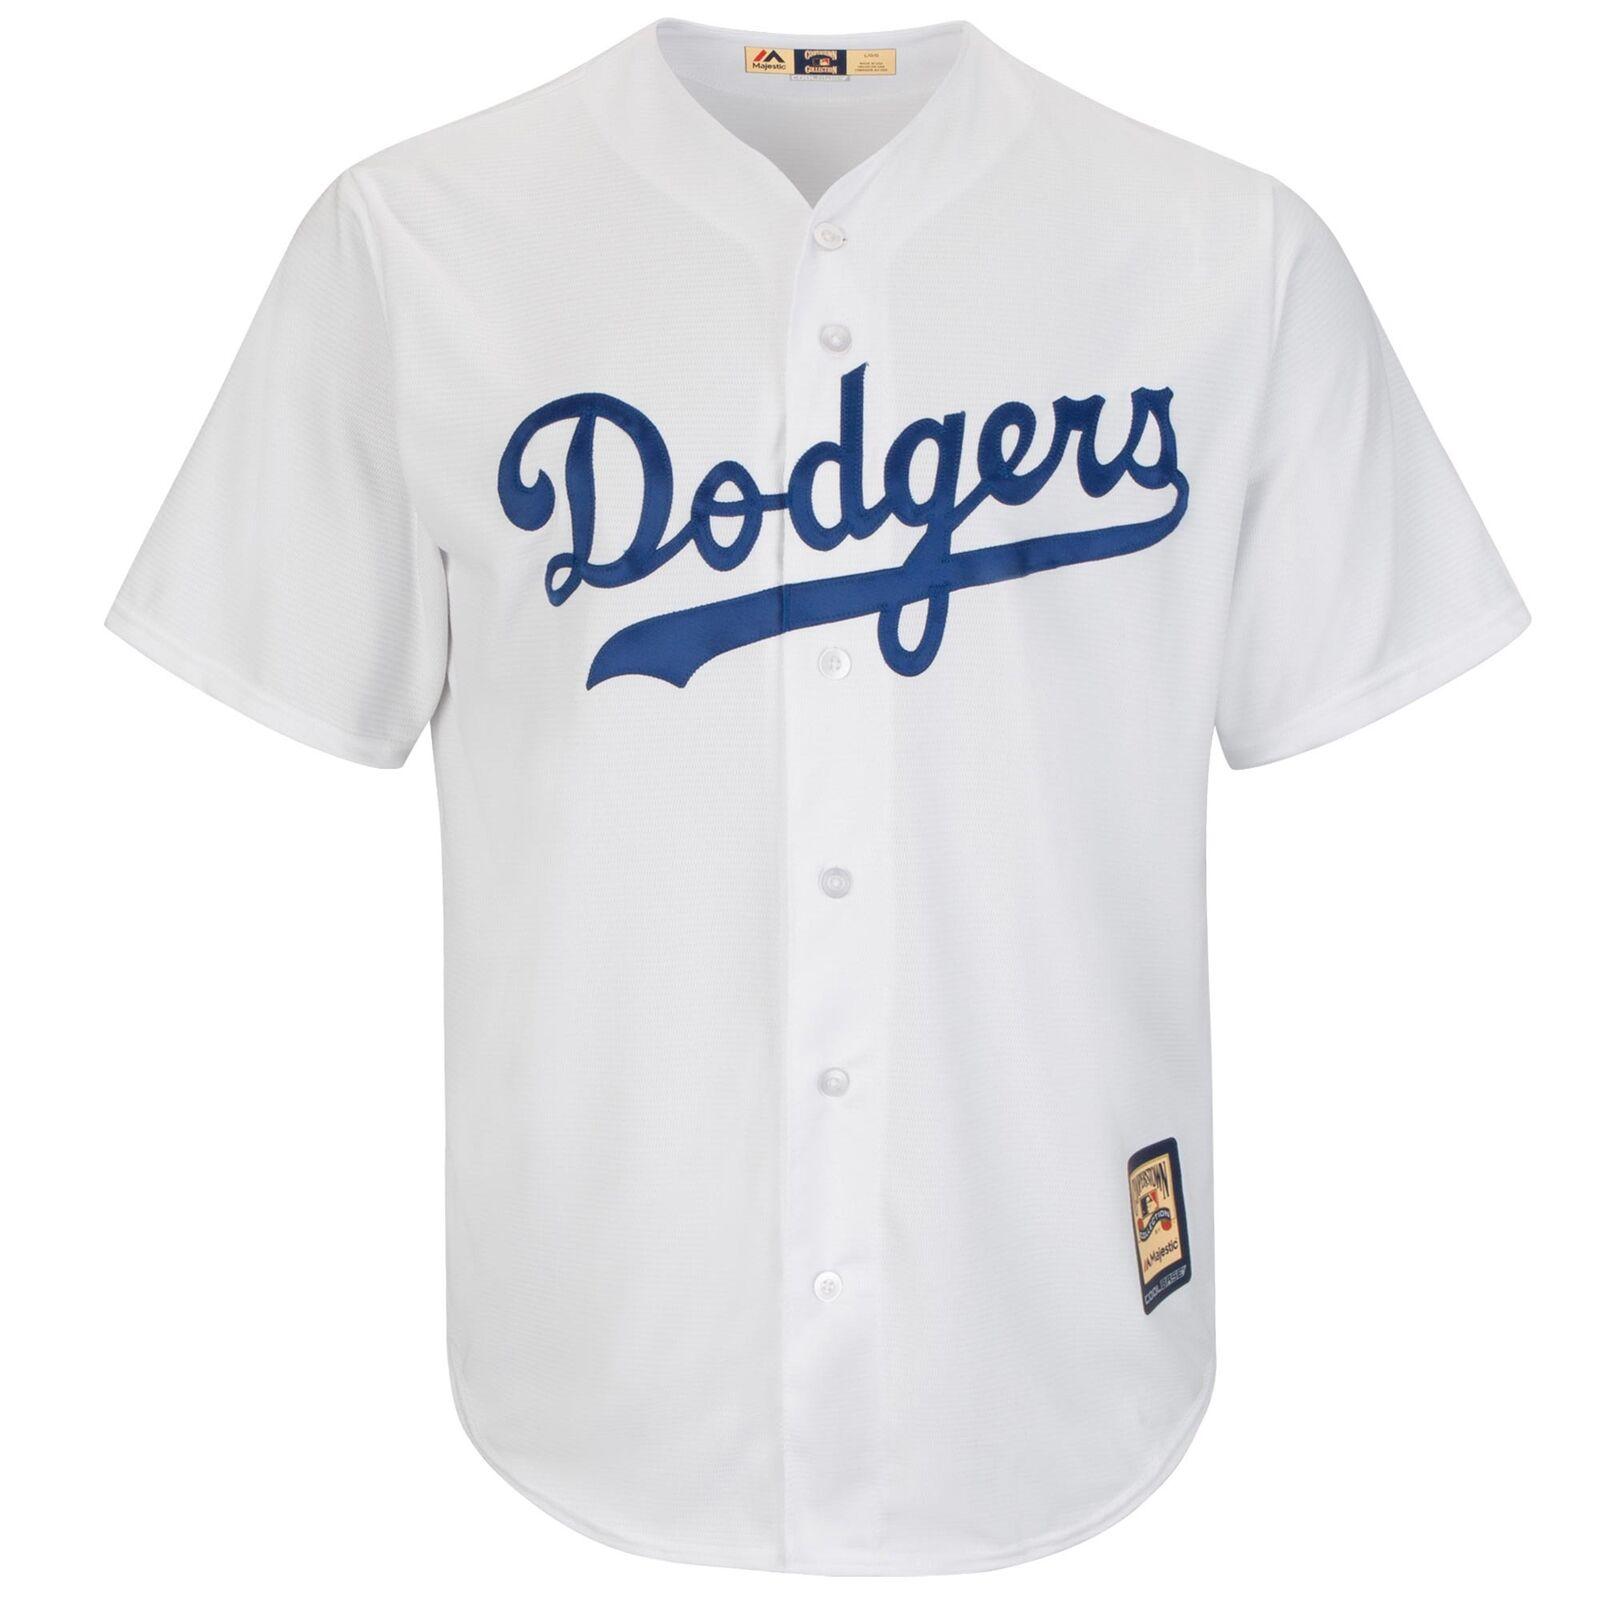 MLB Brooklyn Dodgers Majestic Cooperstown Cool Base Trikot Sport Shirt Herren